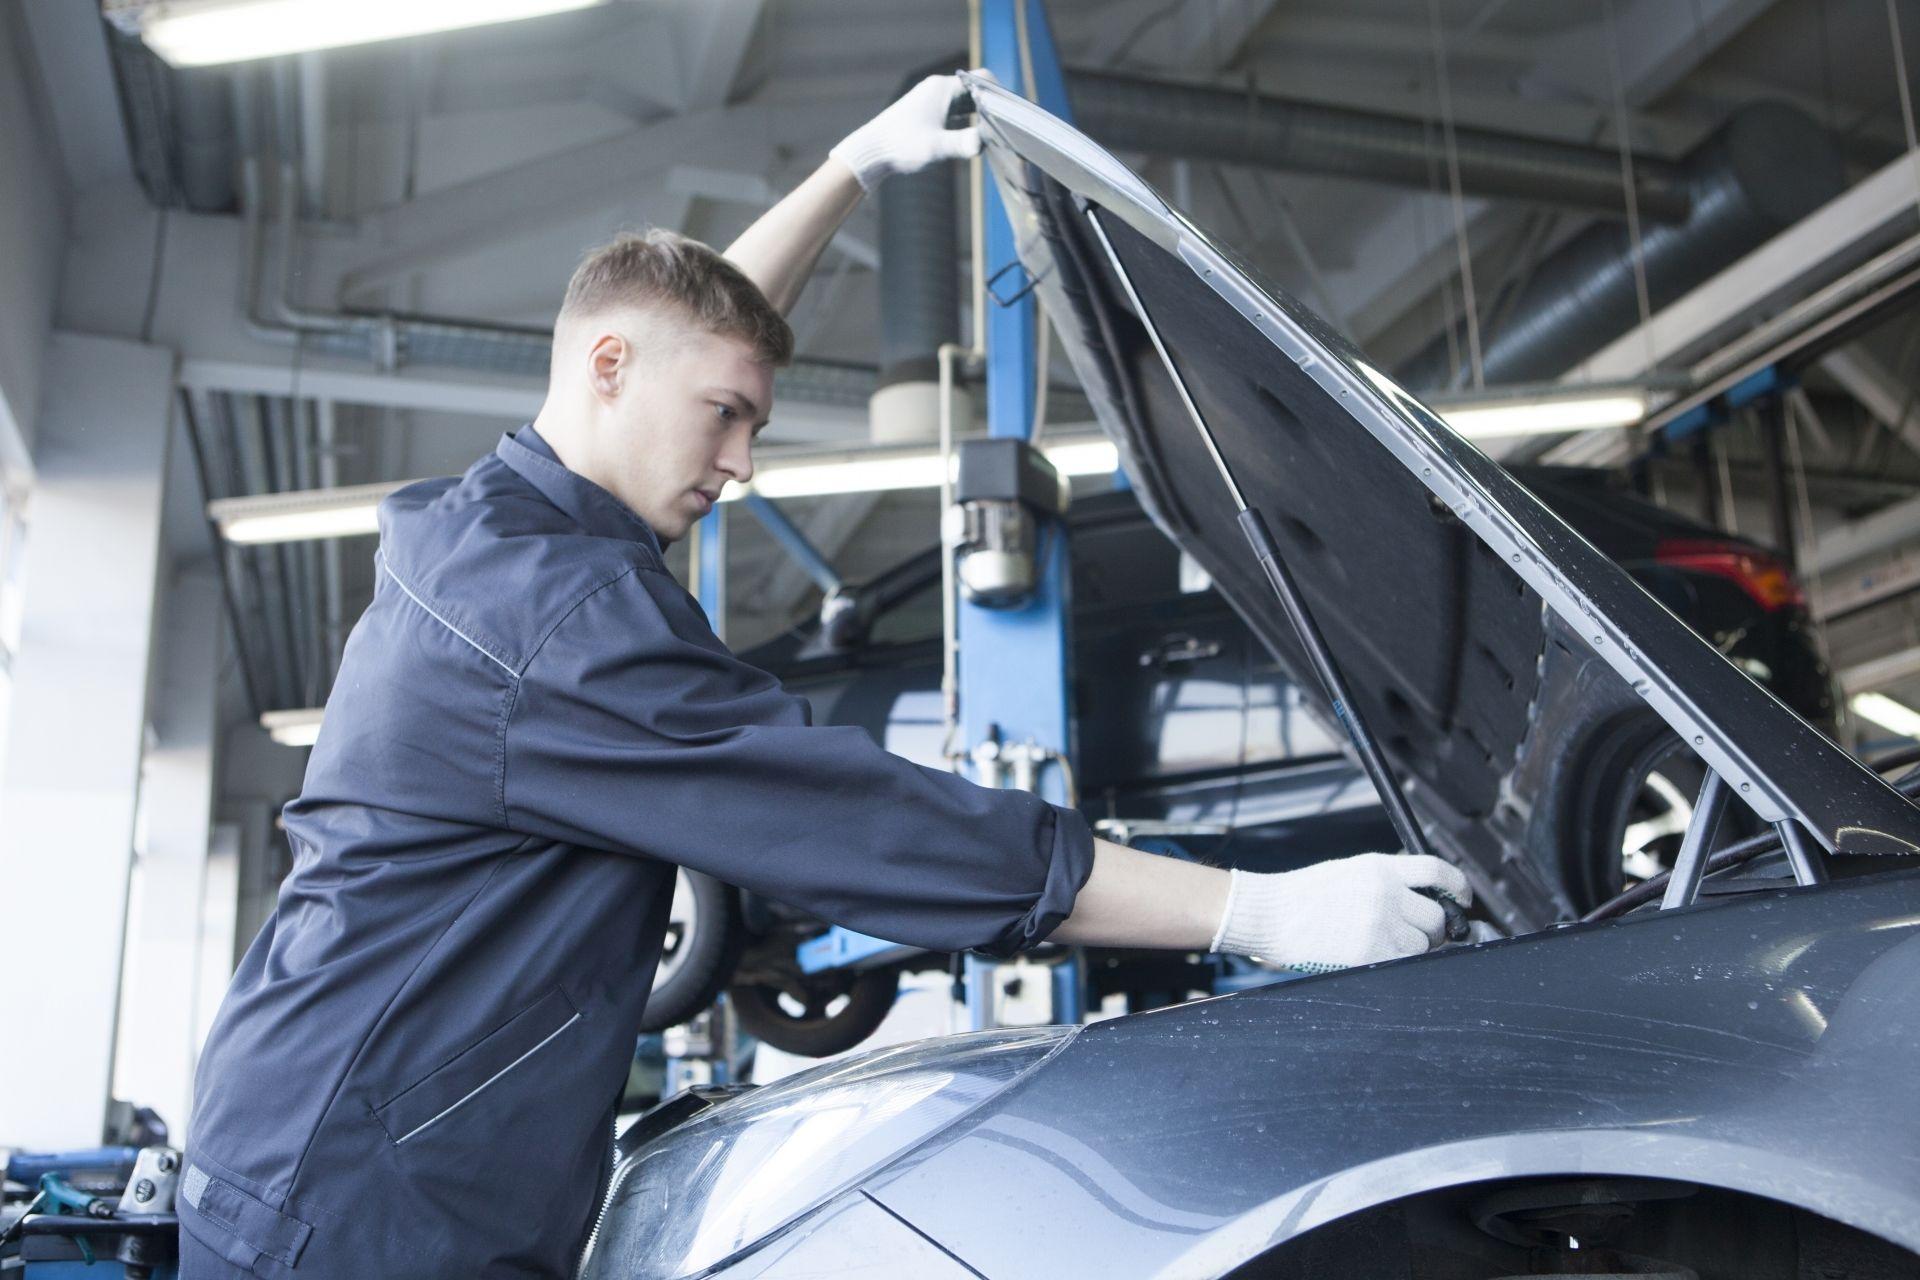 CASEを見越した再編が加速 2019年の自動車・部品業界